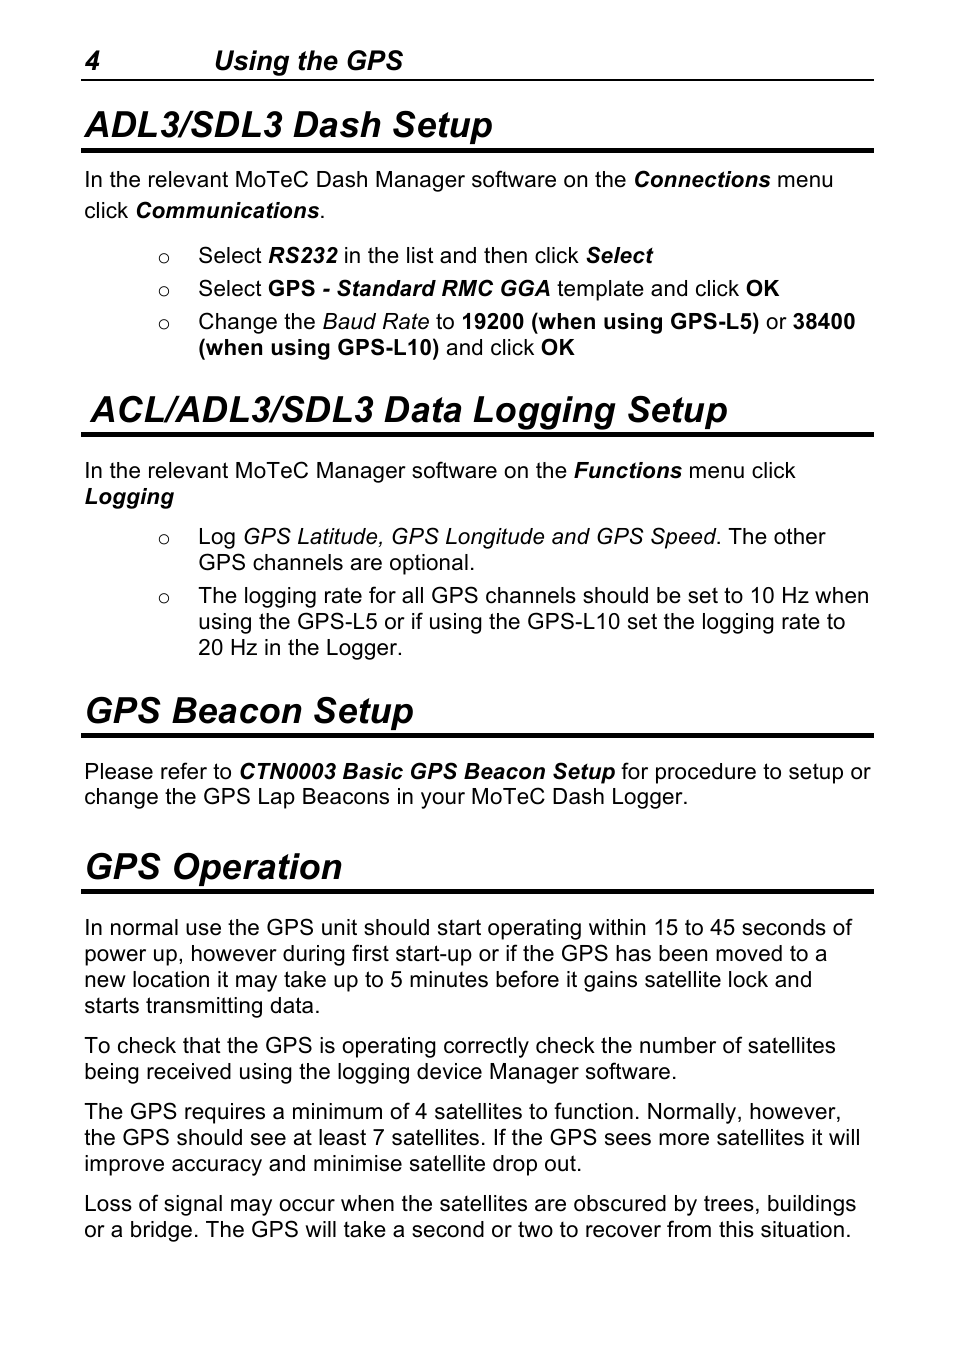 Adl3/sdl3 dash setup, Acl/adl3/sdl3 data logging setup, Gps